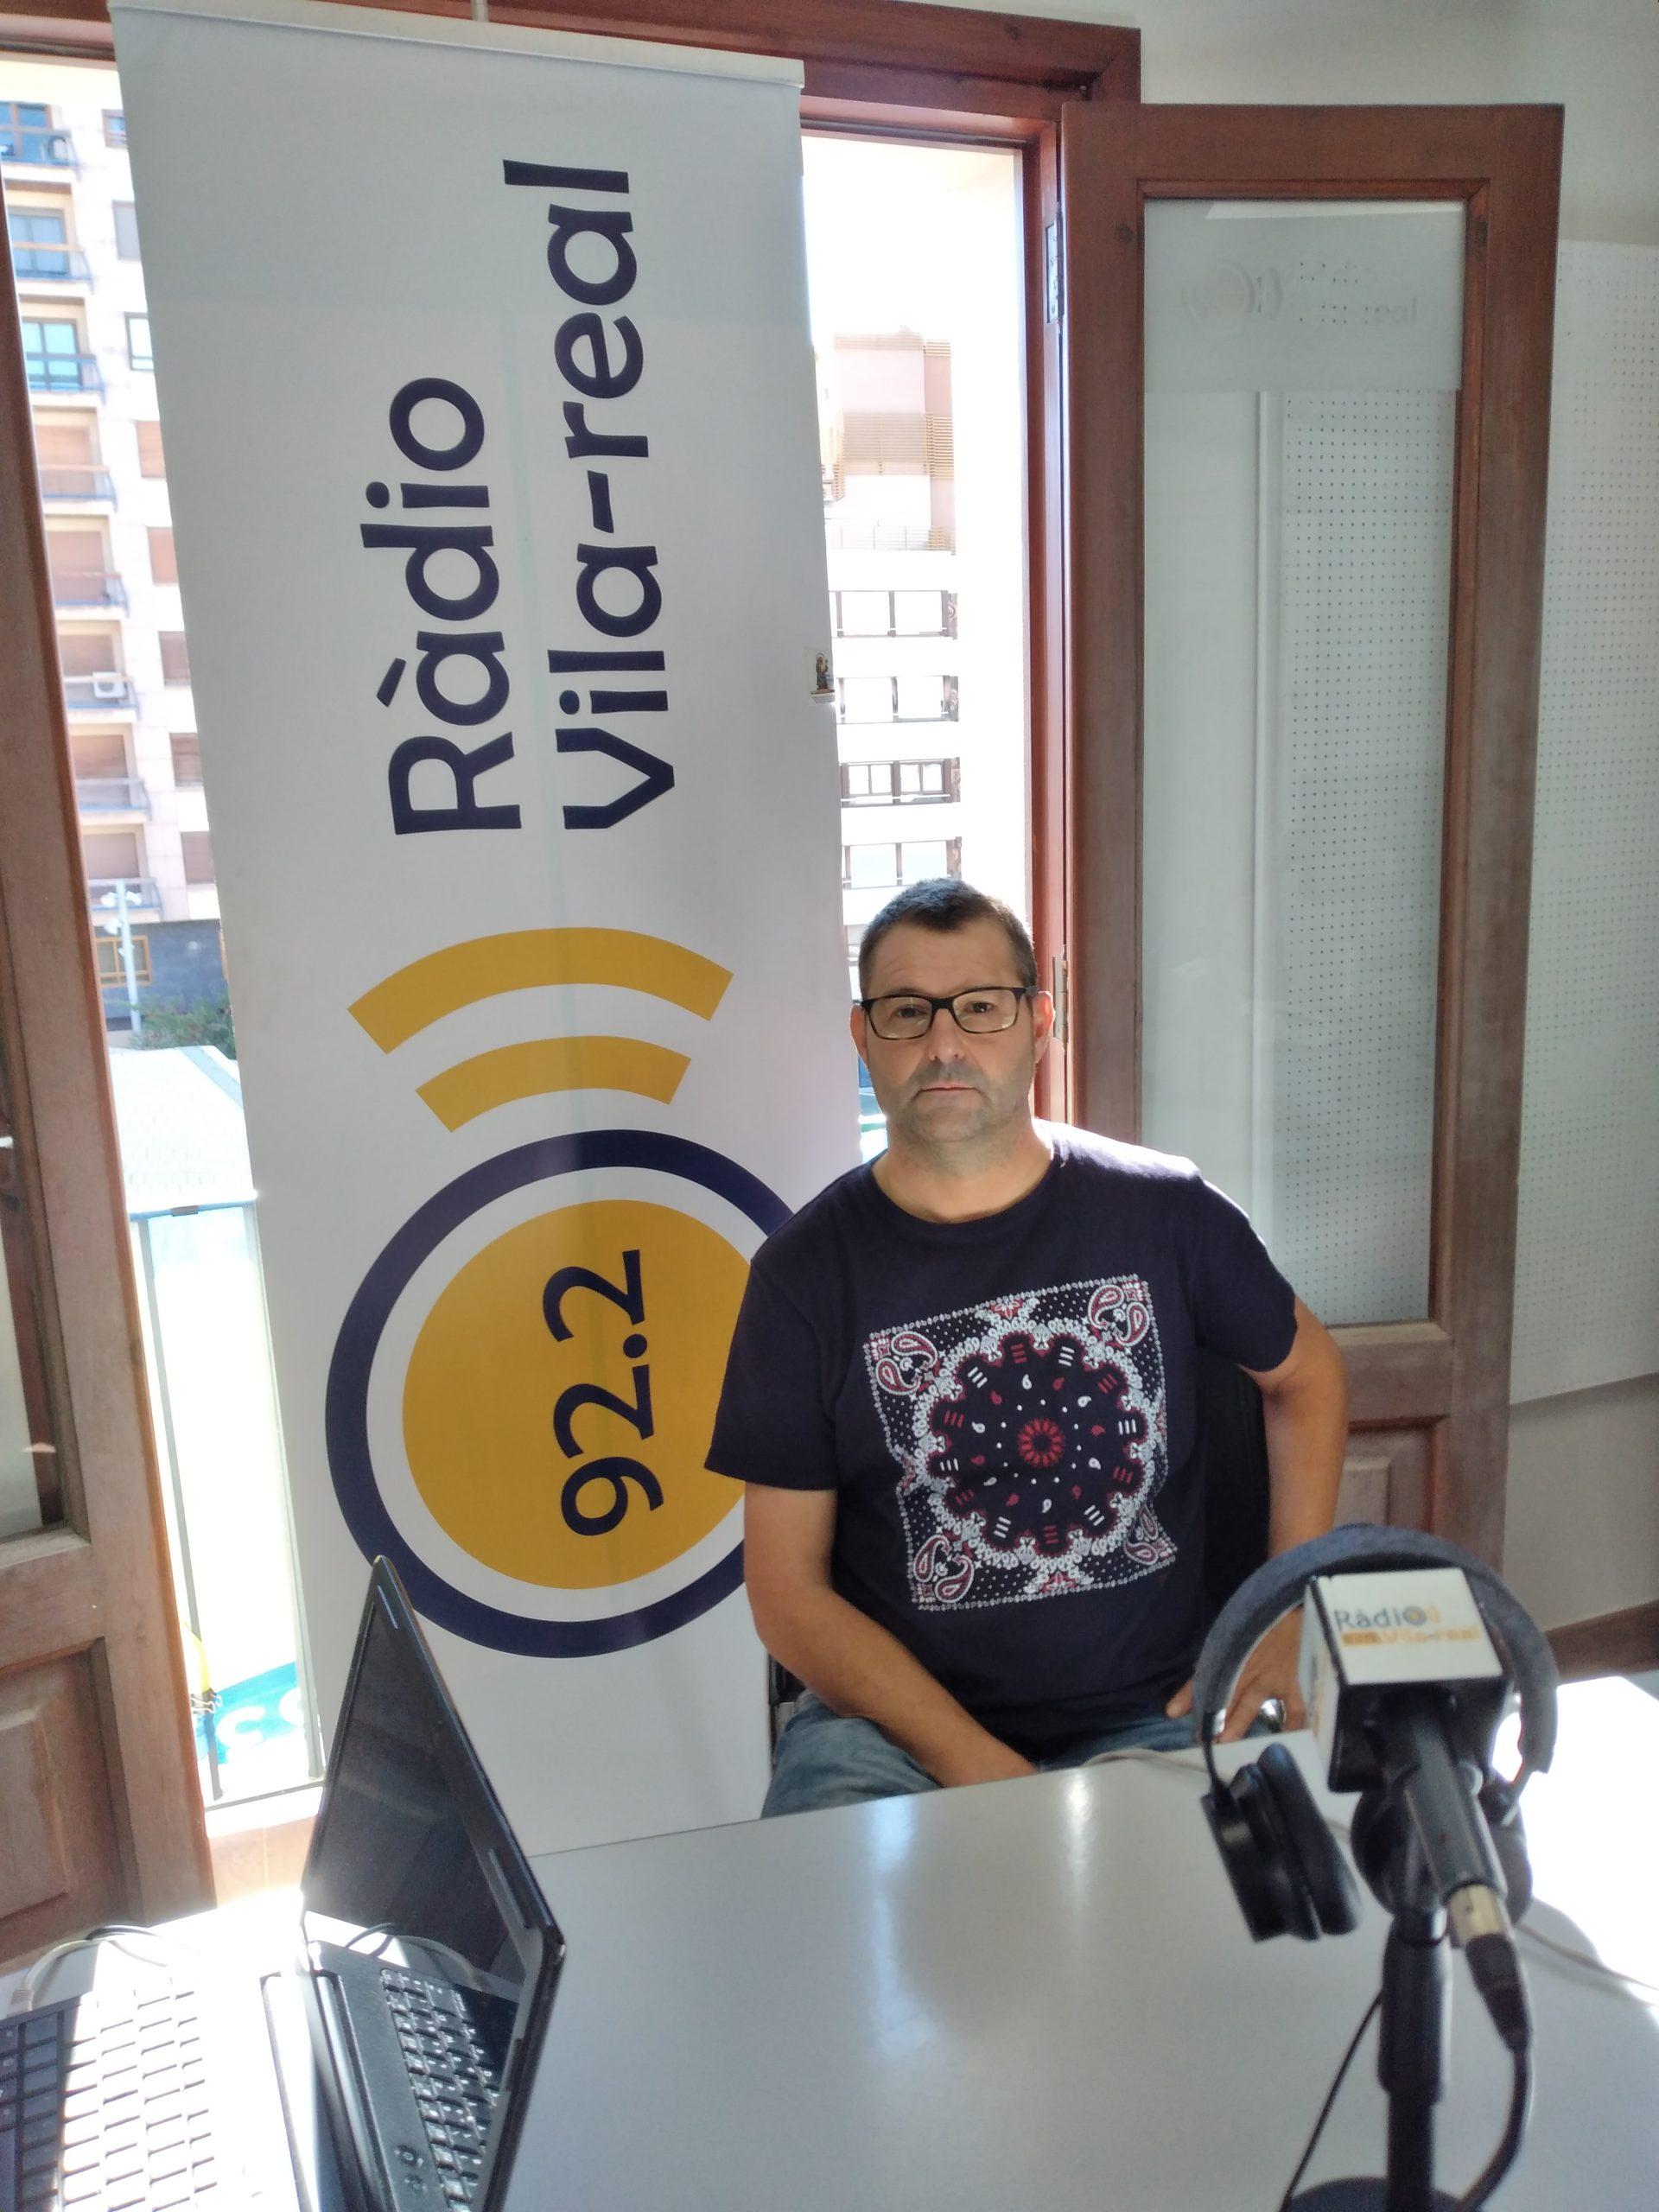 Entrevista al agricultor, Ángel Sebastiá